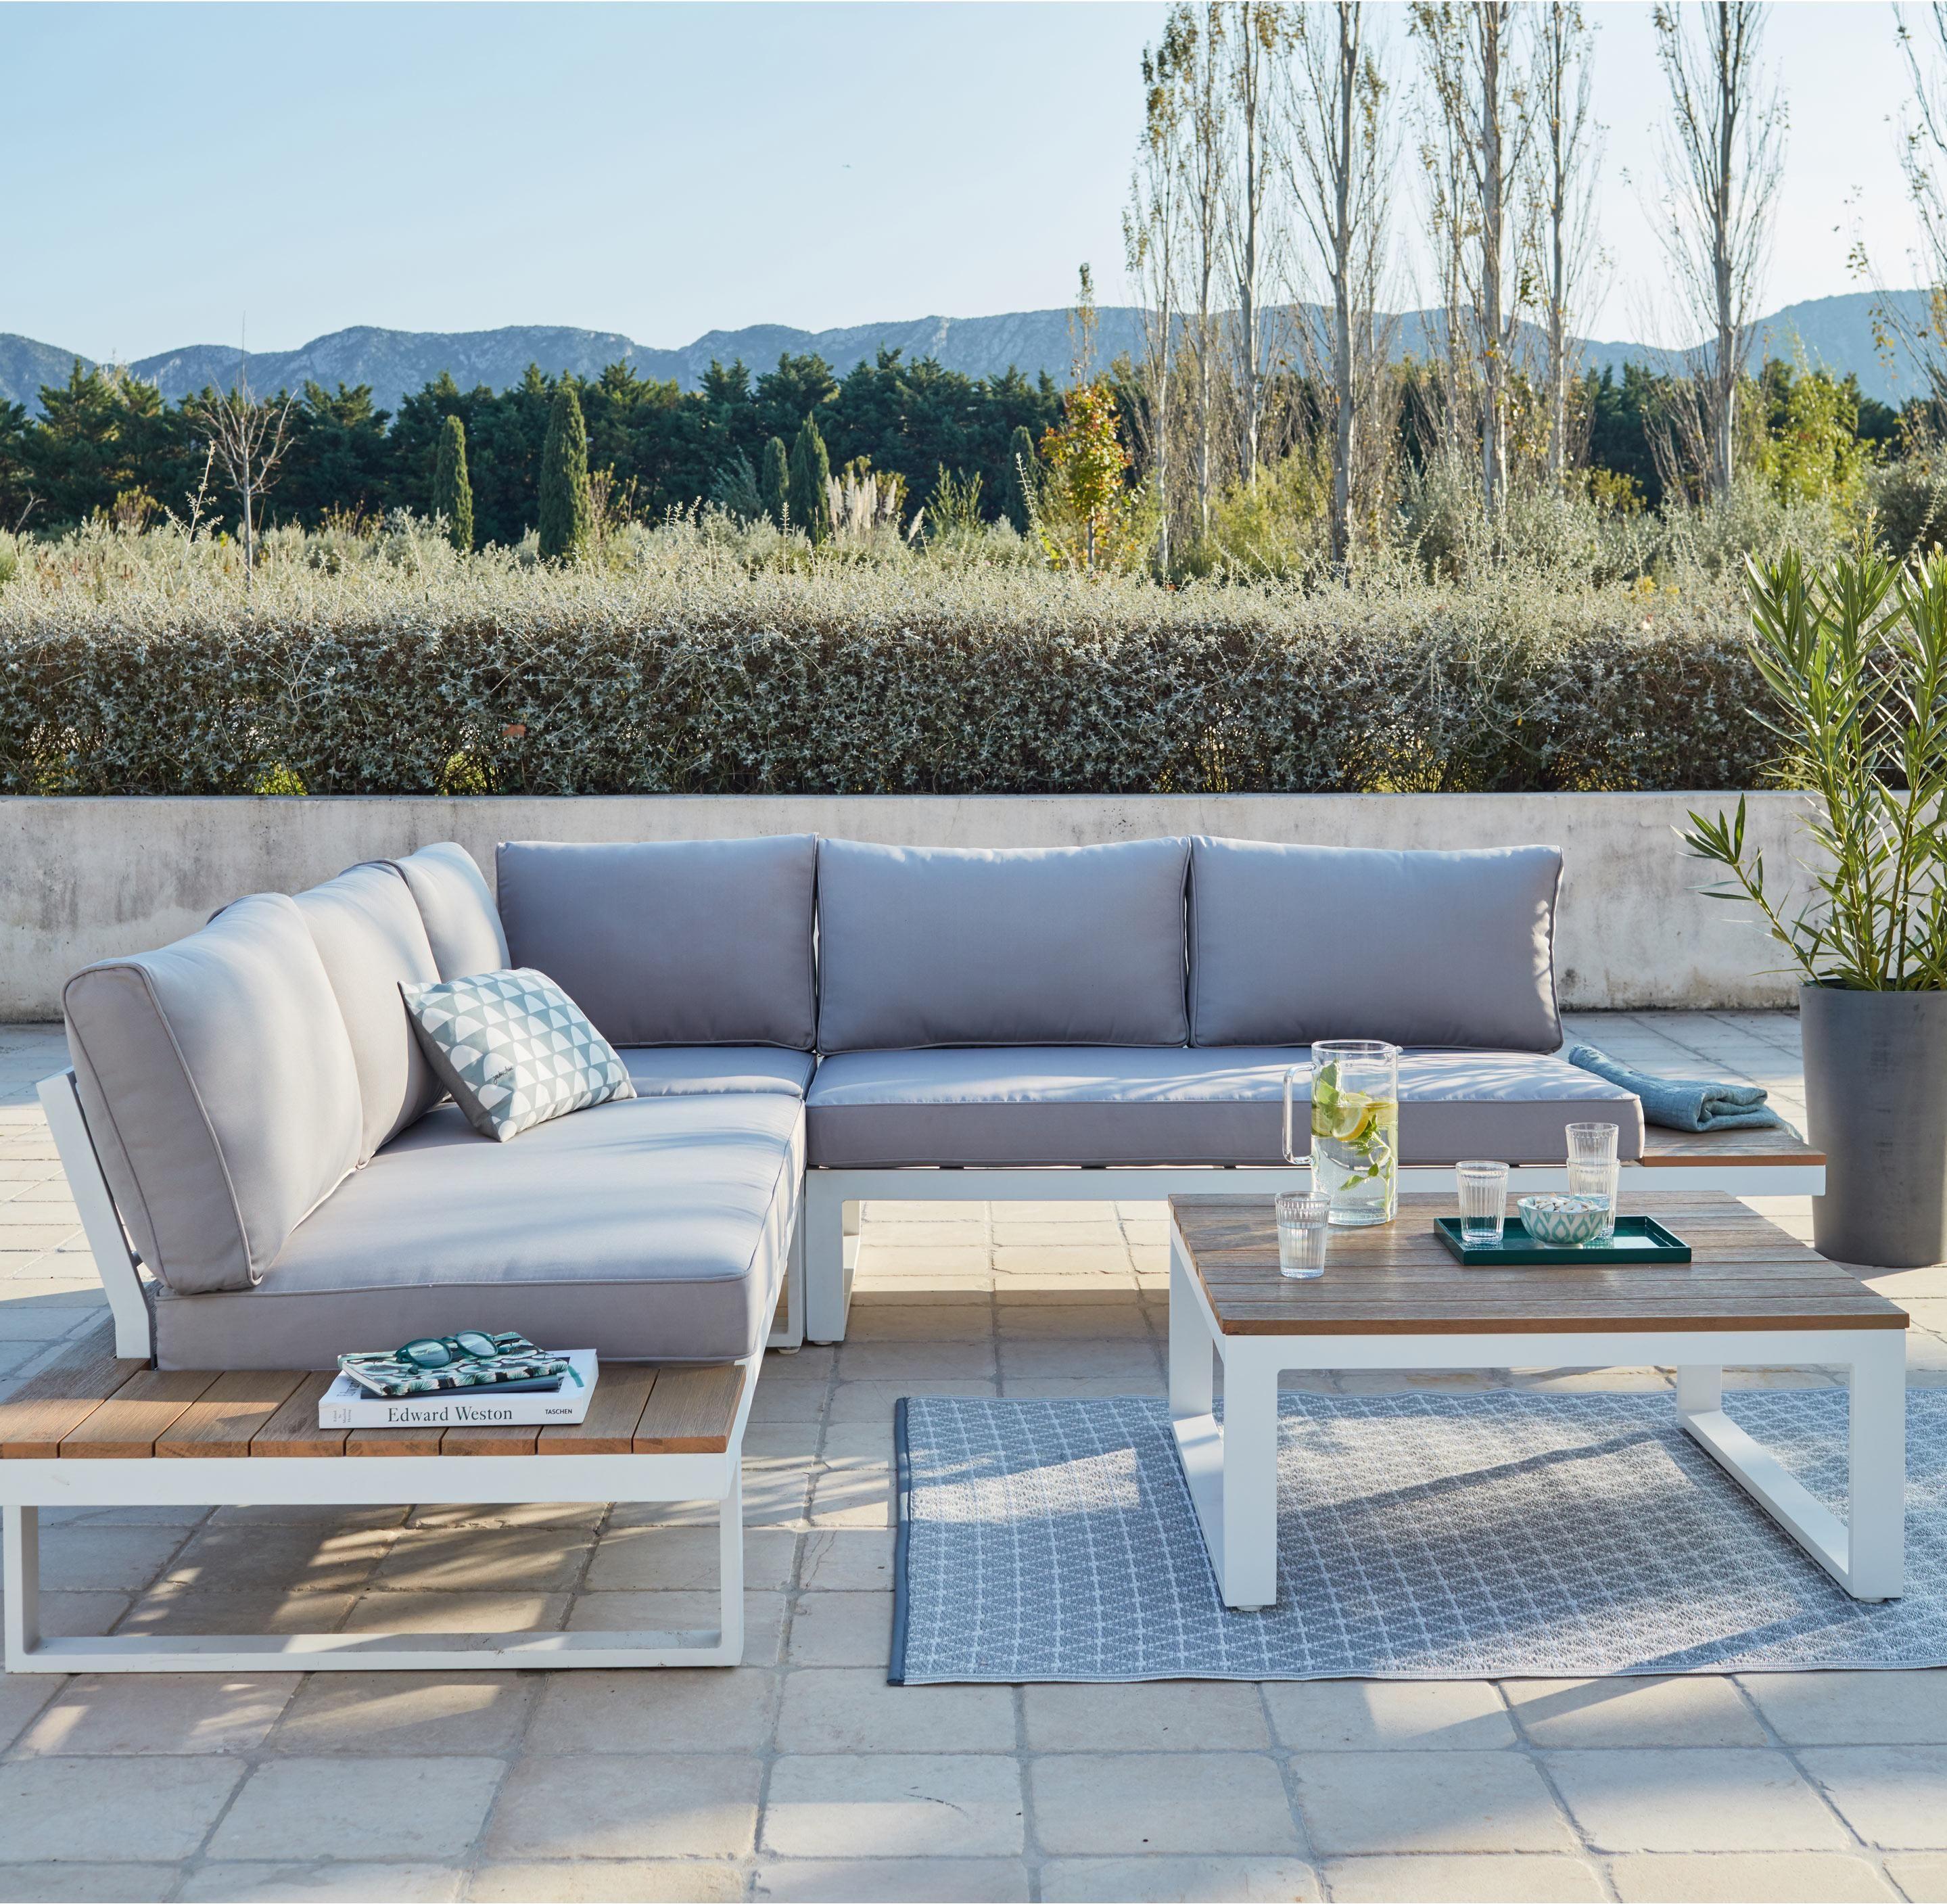 Salon Bas De Jardin San Diego Aluminium Blanc 5 Personnes Leroy Merlin En 2020 Salon De Jardin Aluminium Salon De Jardin Mobilier Jardin